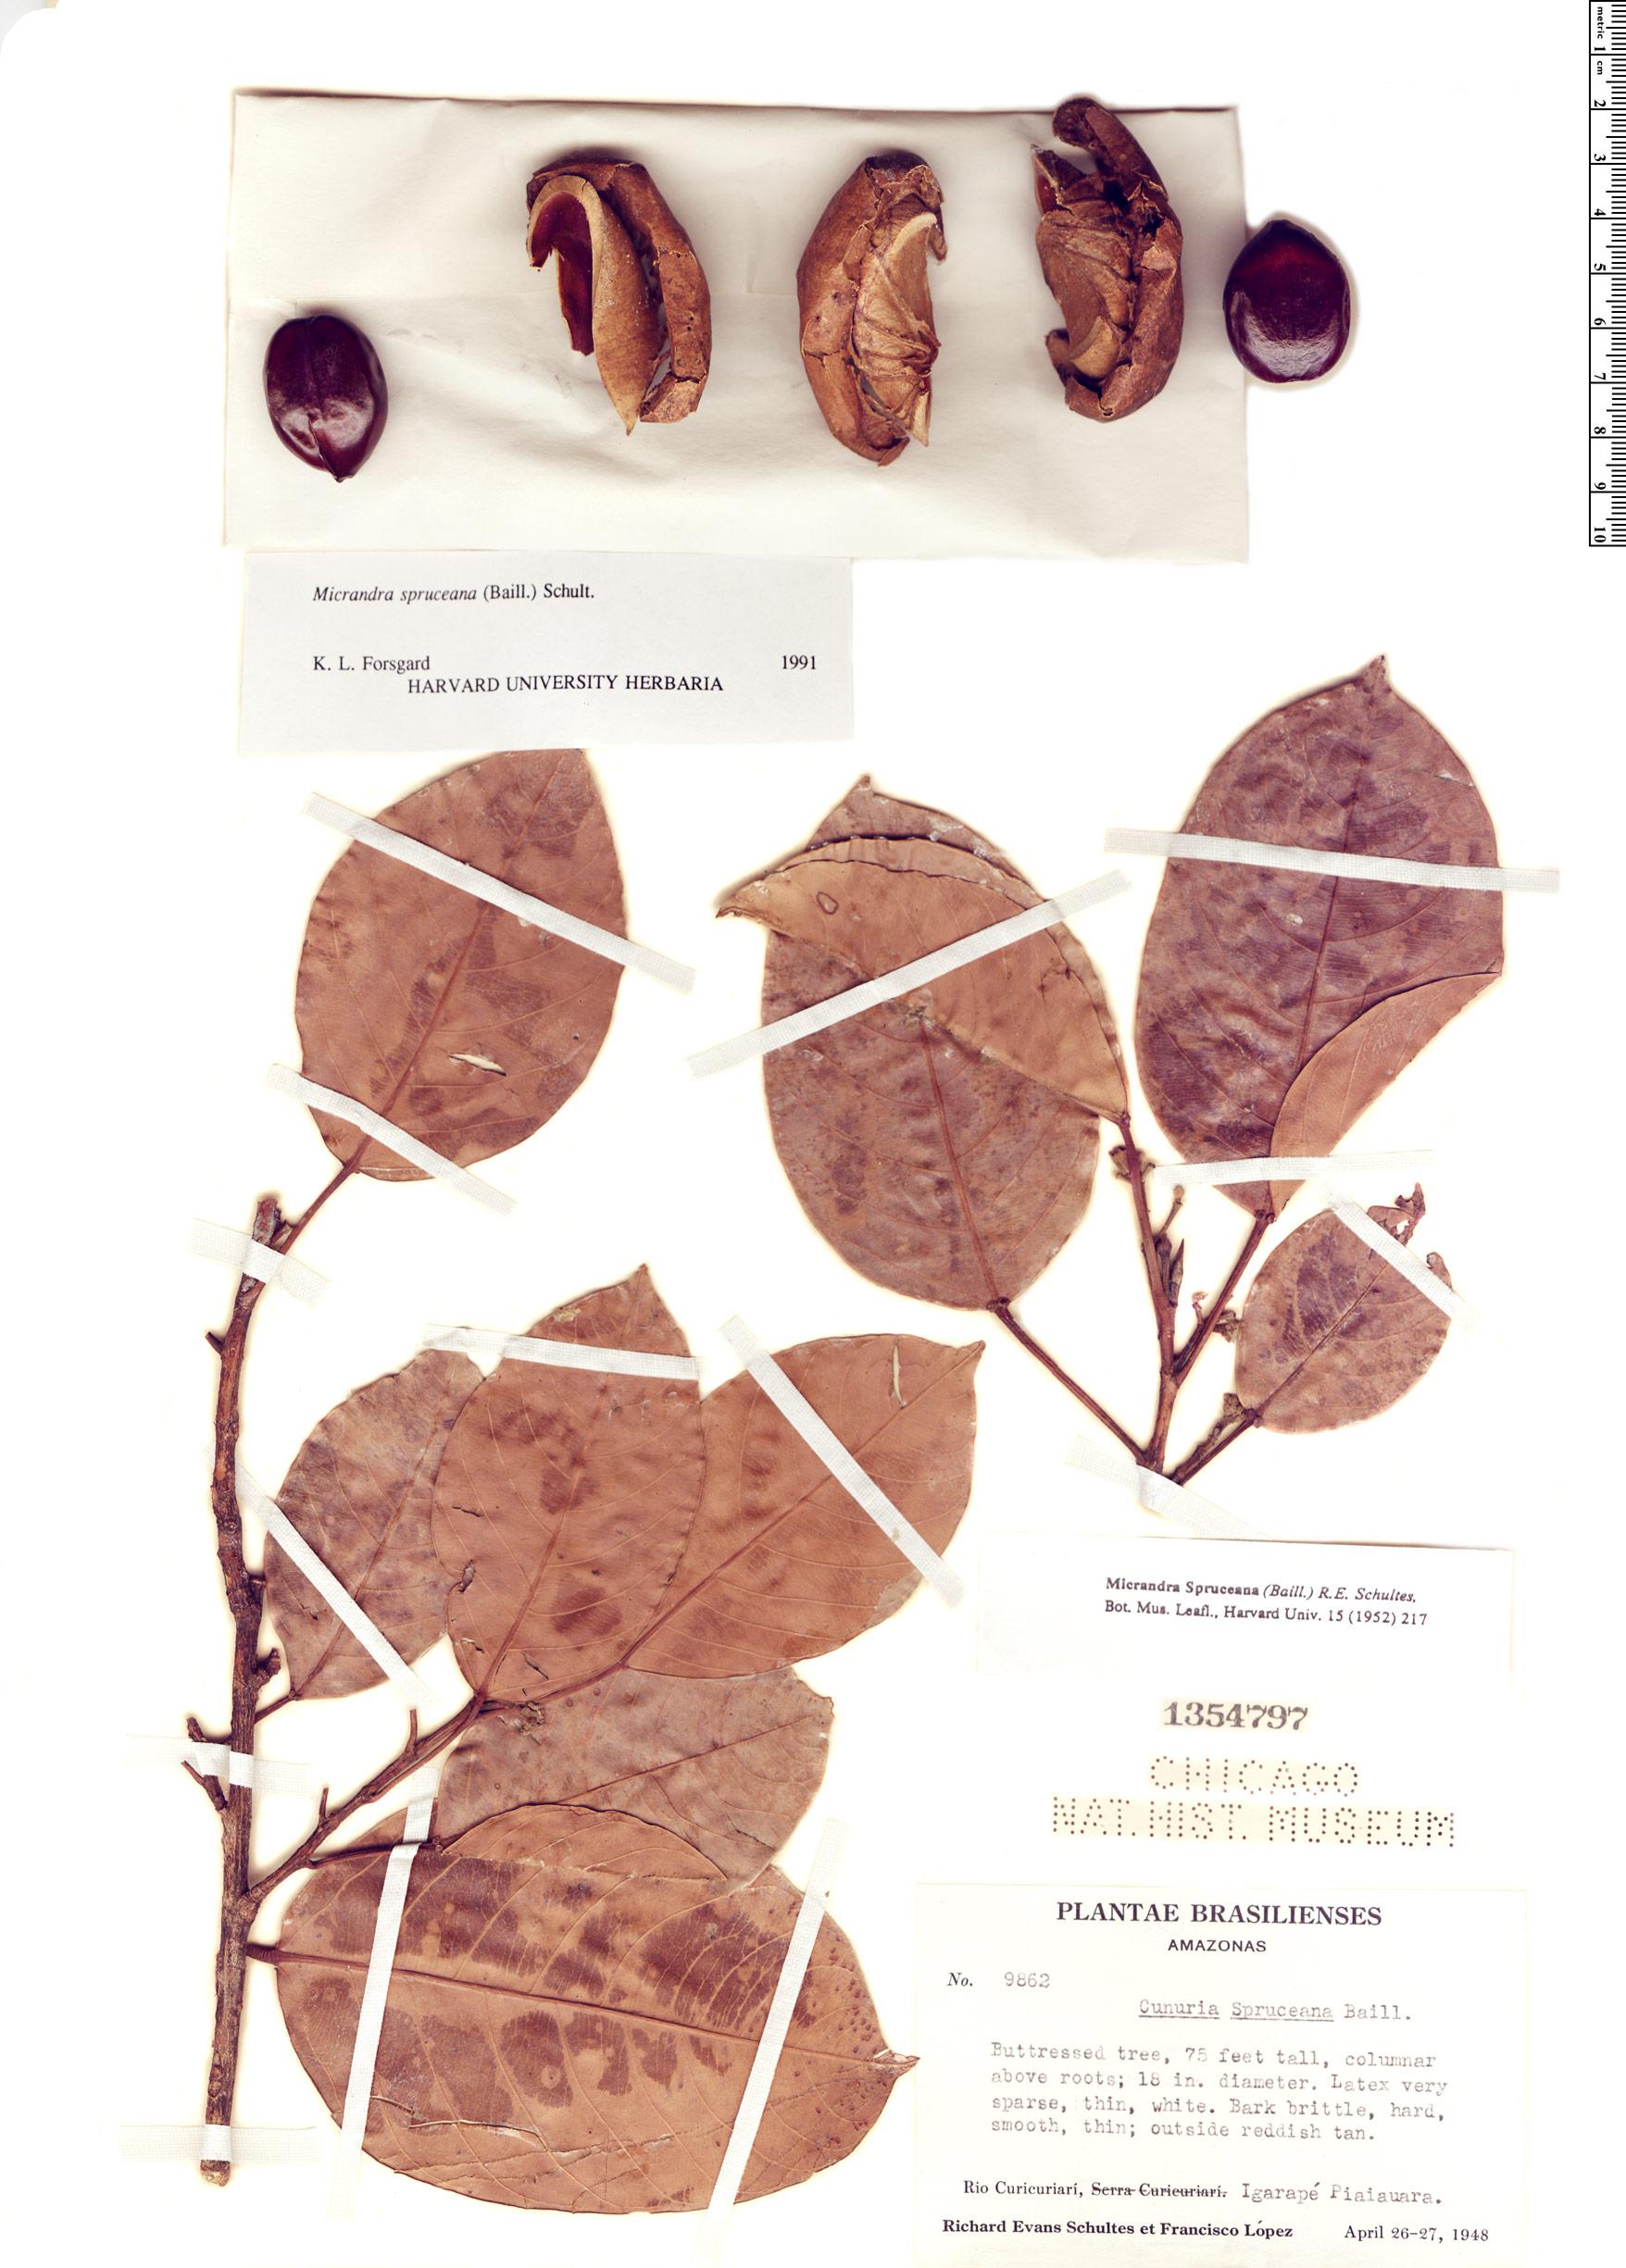 Espécime: Micrandra spruceana